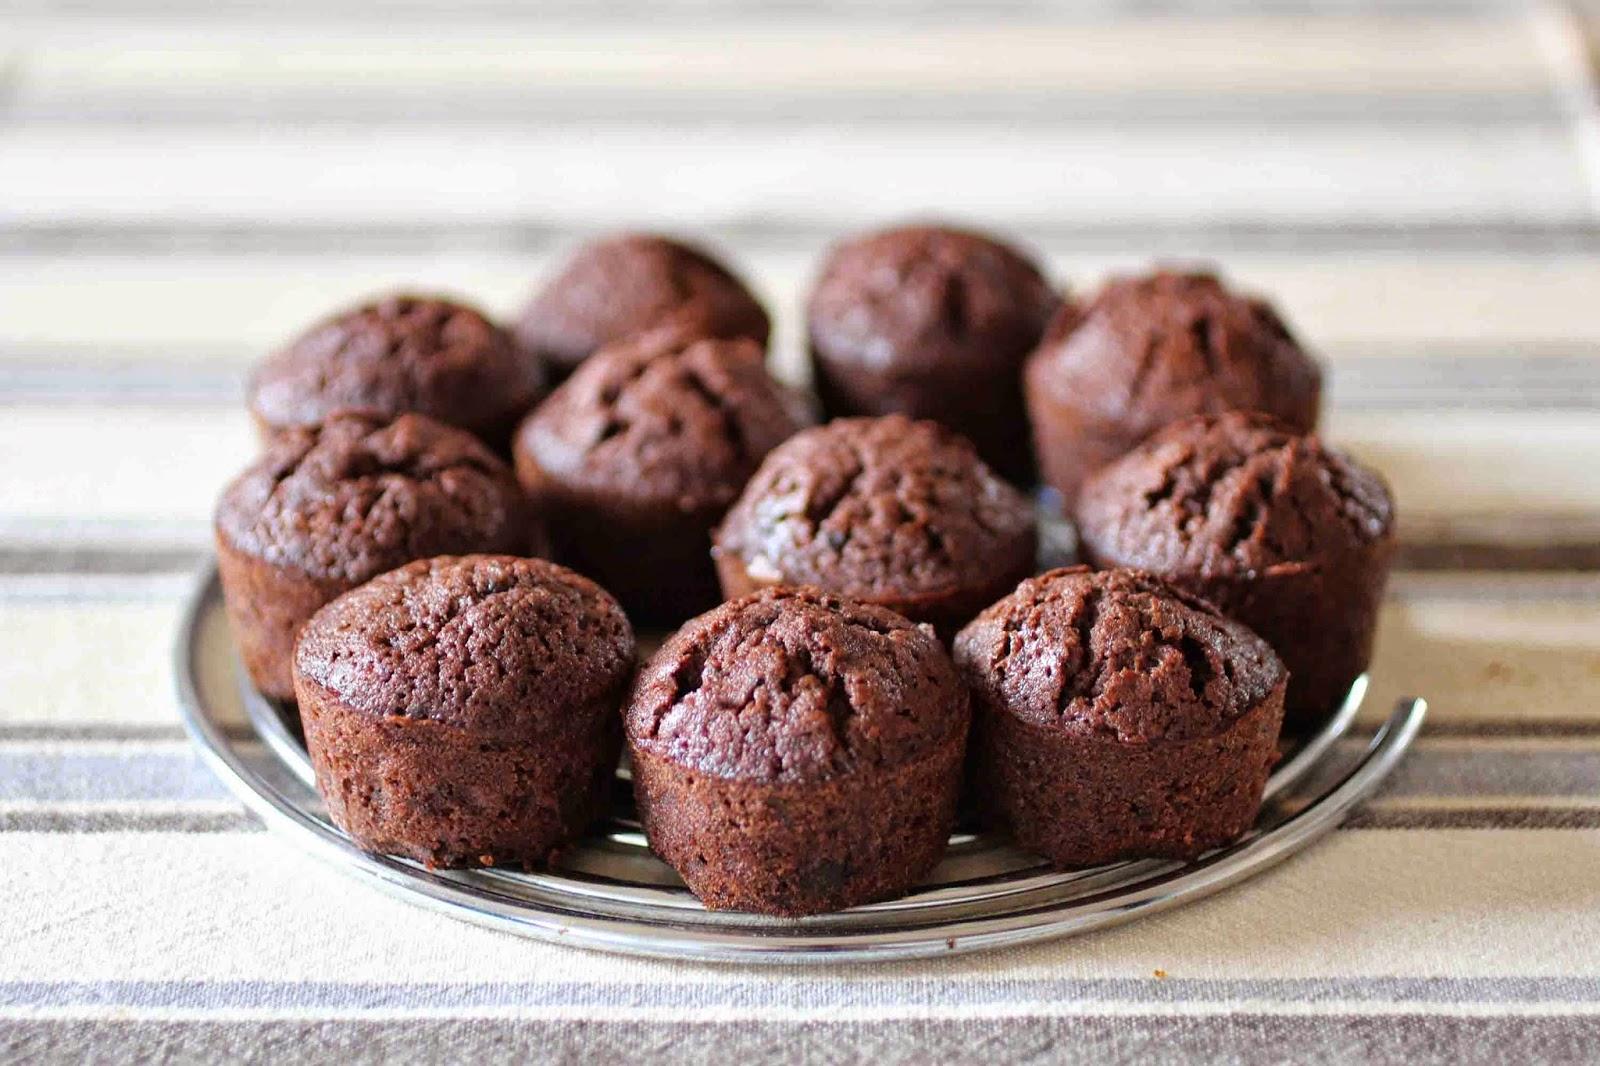 Les p'tits muffins tout chocolat